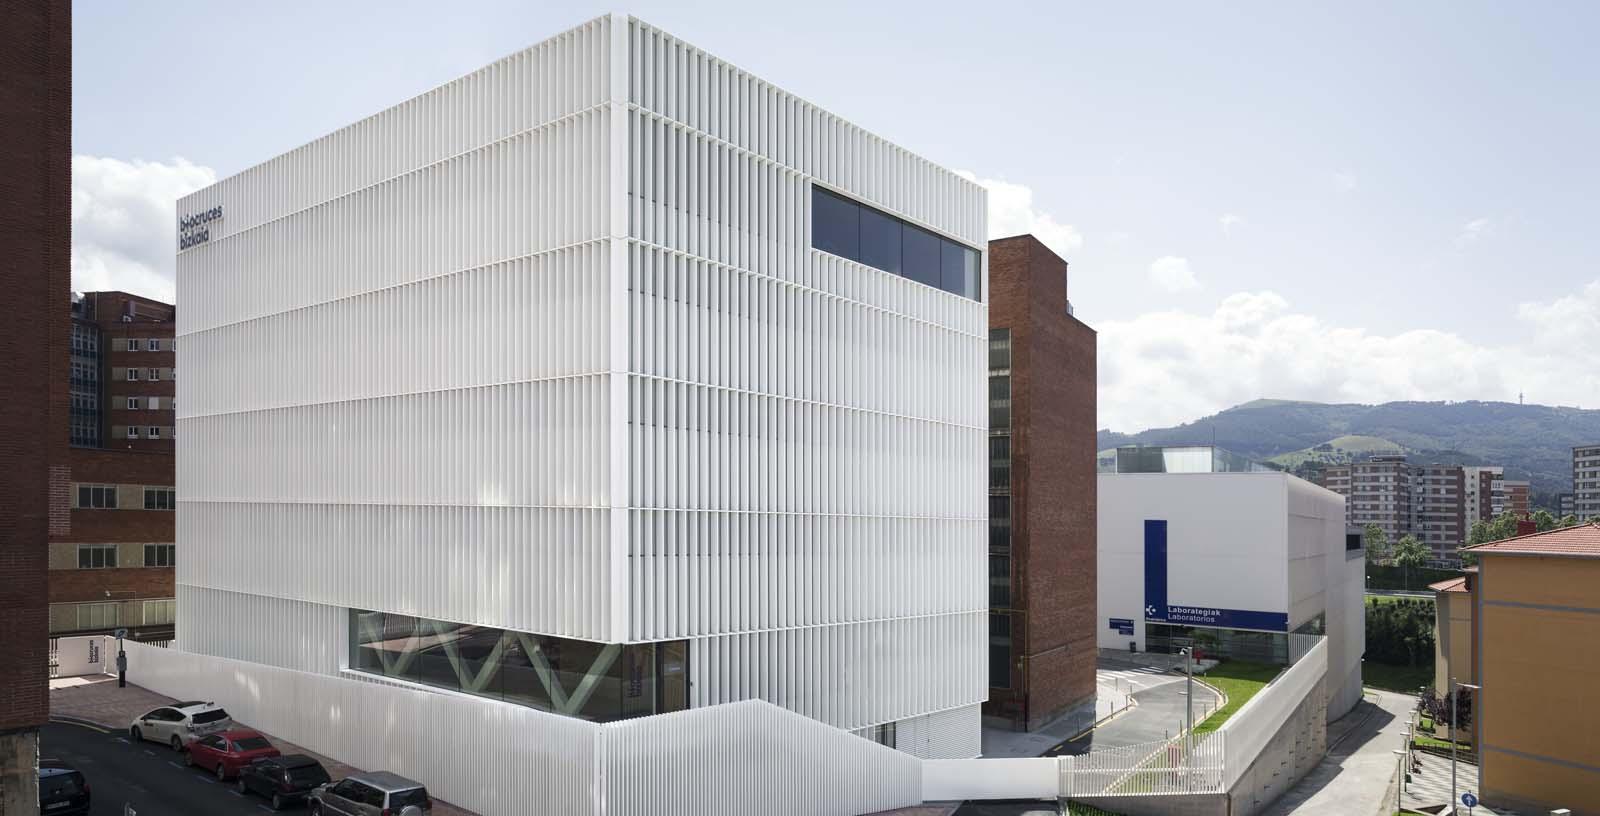 Biocruces_Institute_Architecture_01_IDOM_copyright_Aitor_Ortiz